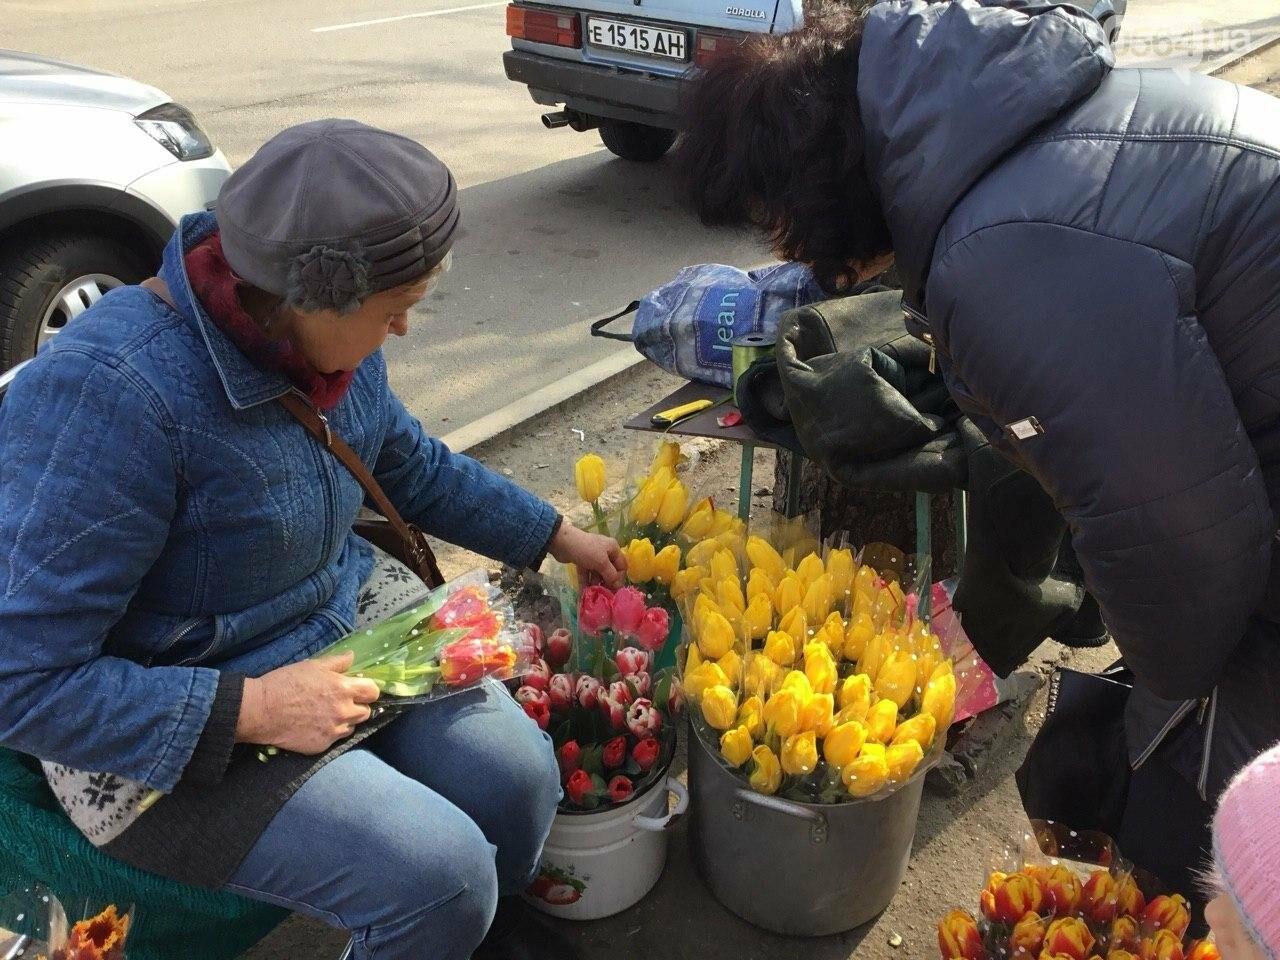 Сколько стоят примула, цикламен, мимоза? Обзор цен на цветы в Кривом Роге, - ФОТО, ВИДЕО, фото-34